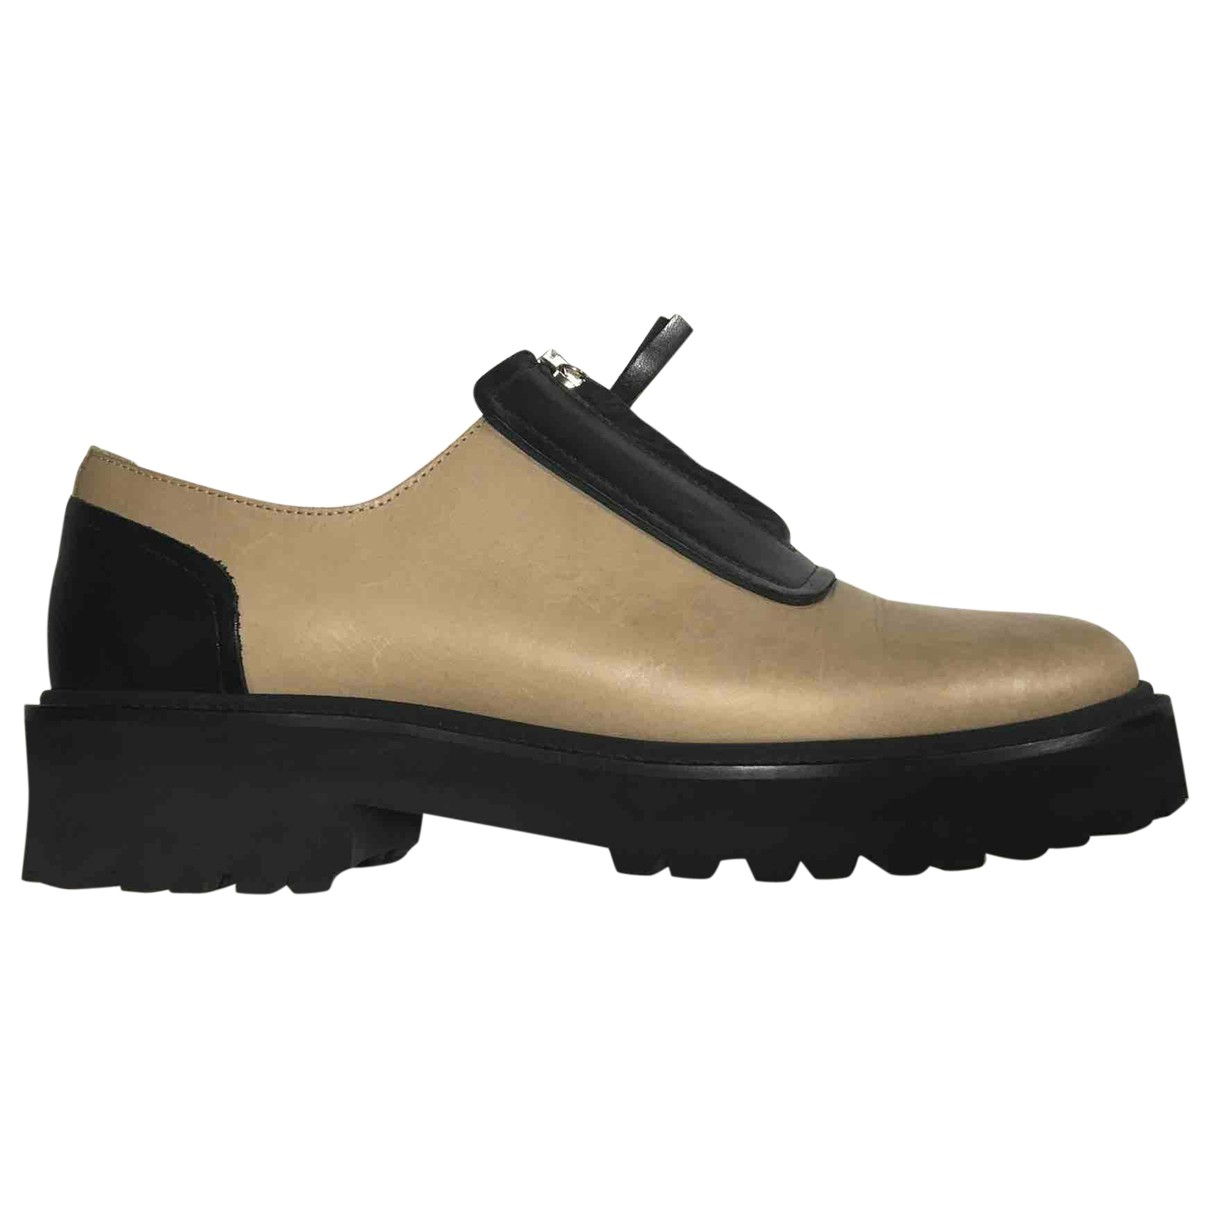 Mm6 \N Black Leather Flats for Women 38 EU